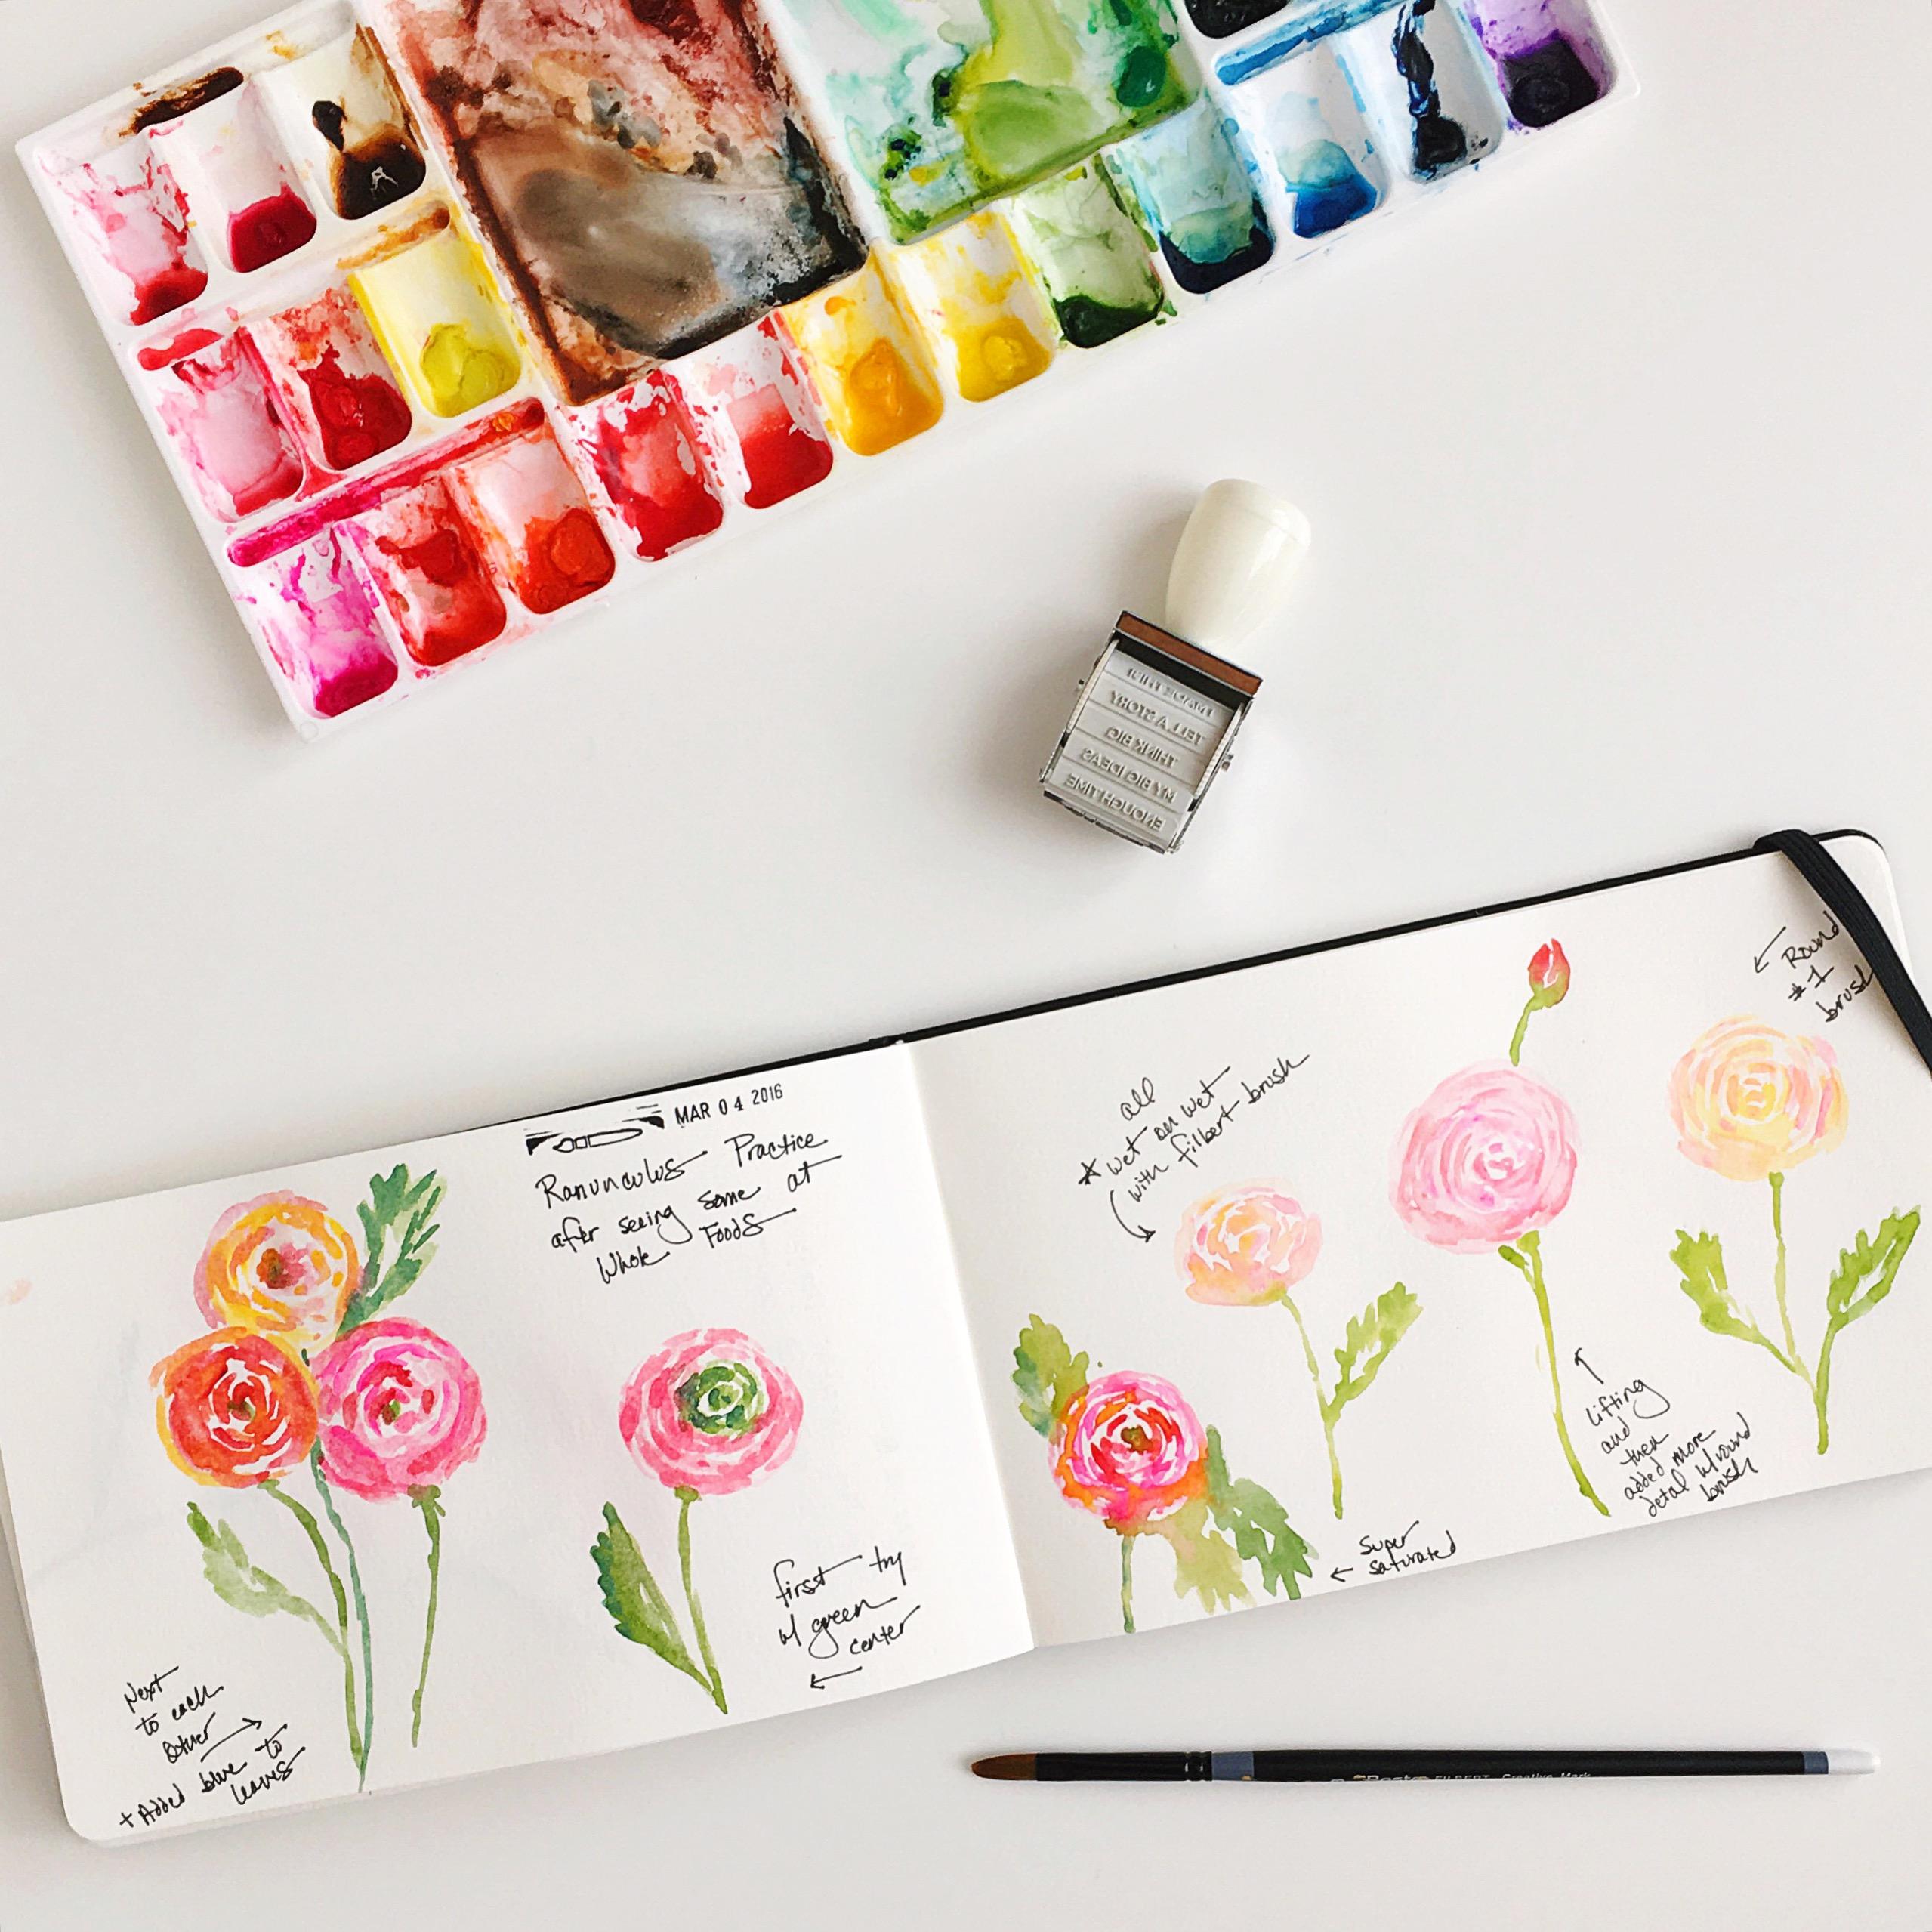 Ranunculus practice by Lisa Spangler